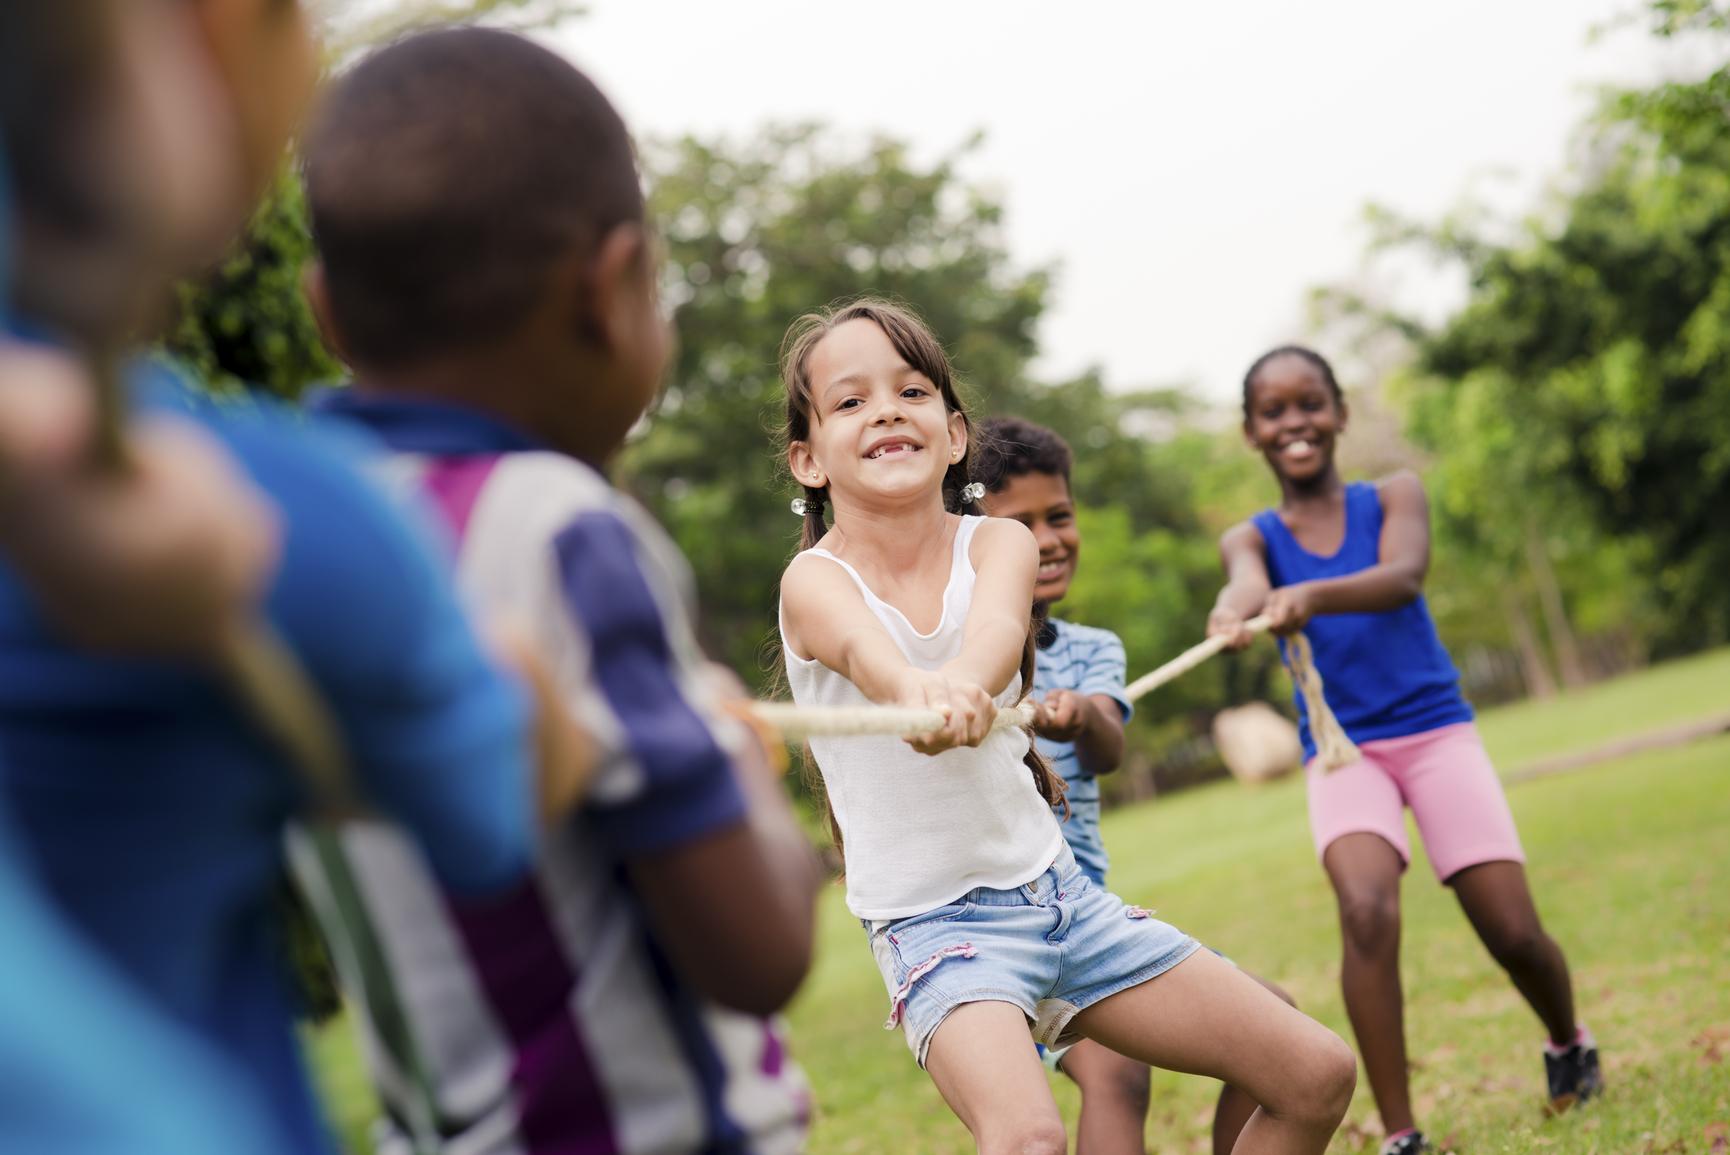 Summer Camp Safety Tips in Richmond TX